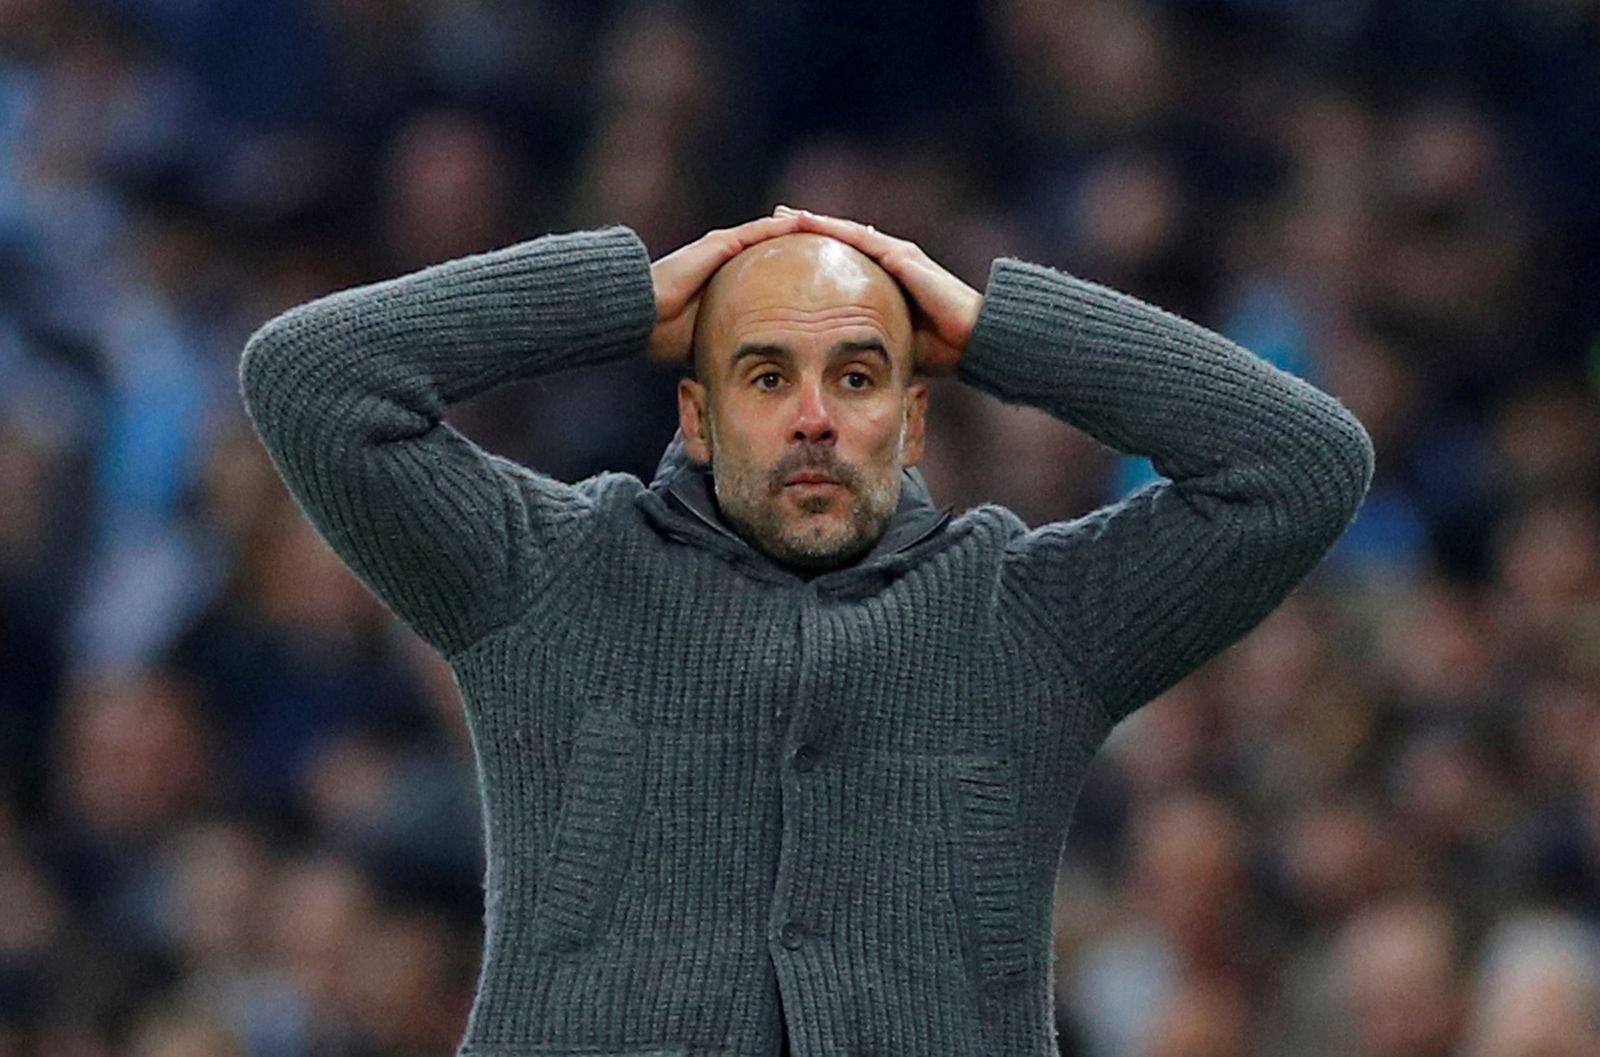 FILE PHOTO: Champions League Quarter Final Second Leg - Manchester City v Tottenham Hotspur